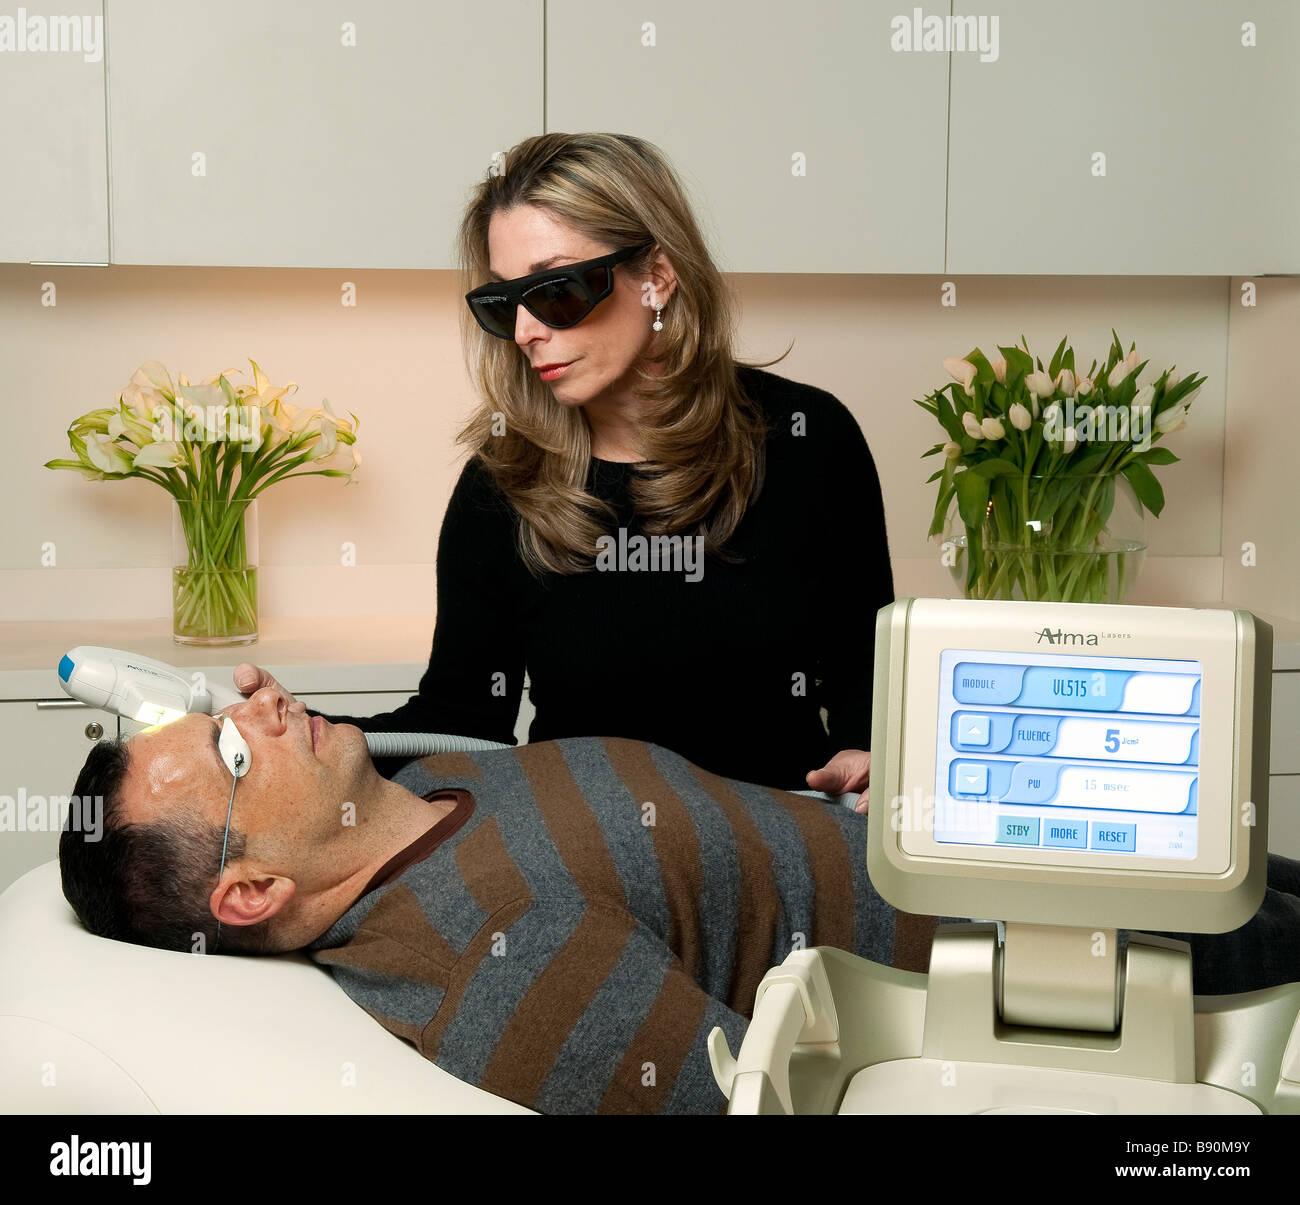 IPL Intense Pulsed Laser Treatment for damaged skin - Stock Image